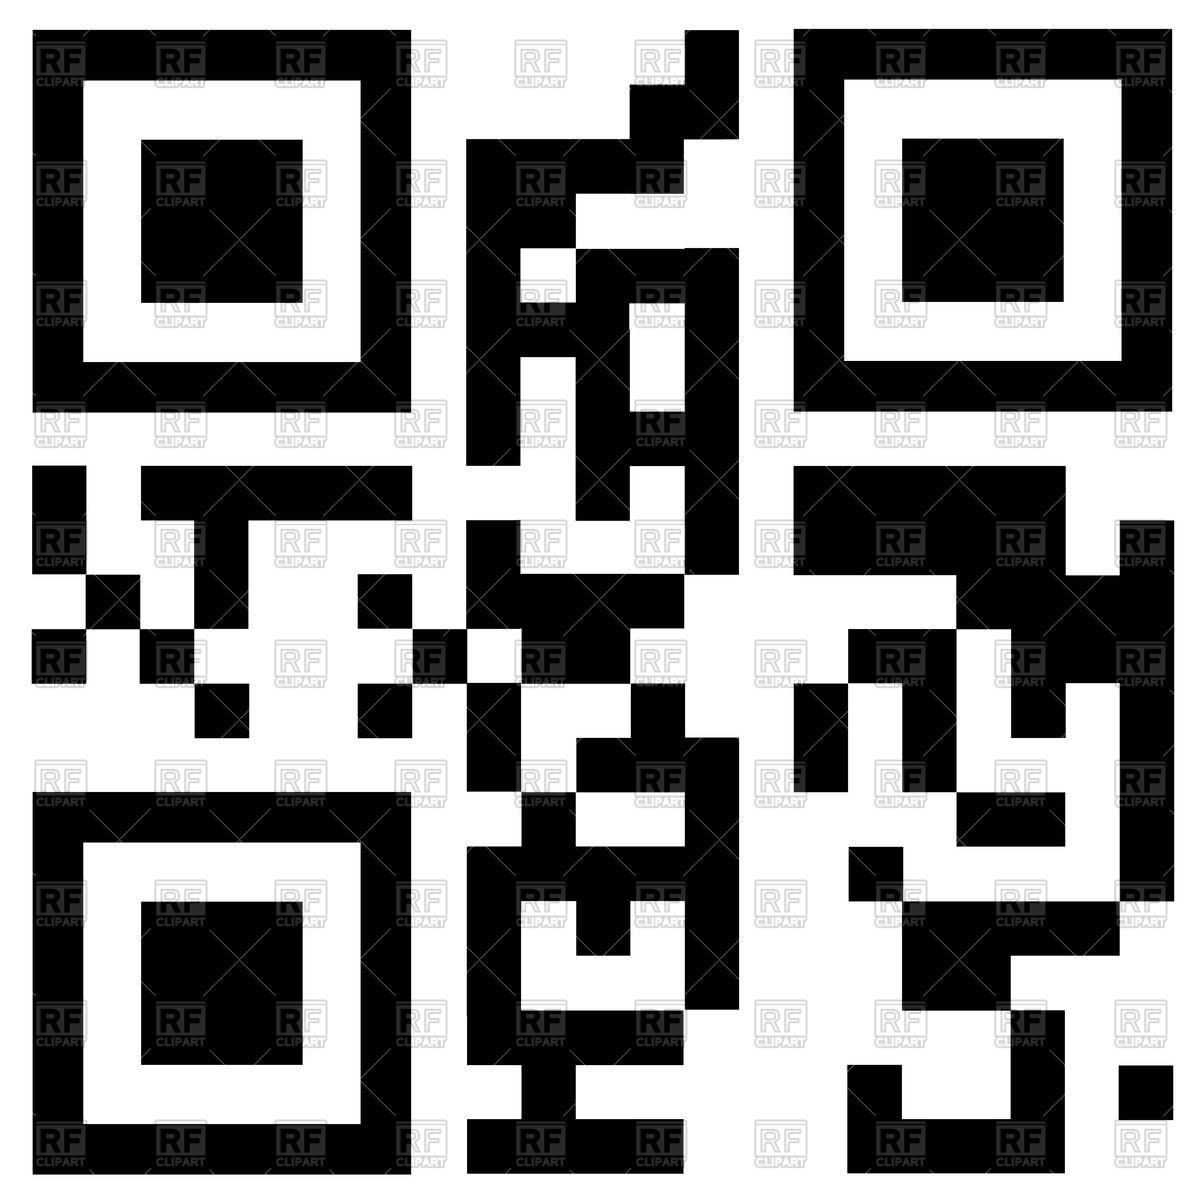 1200x1200 Qr Code Free Shipping Vector Image Vector Artwork Of Design